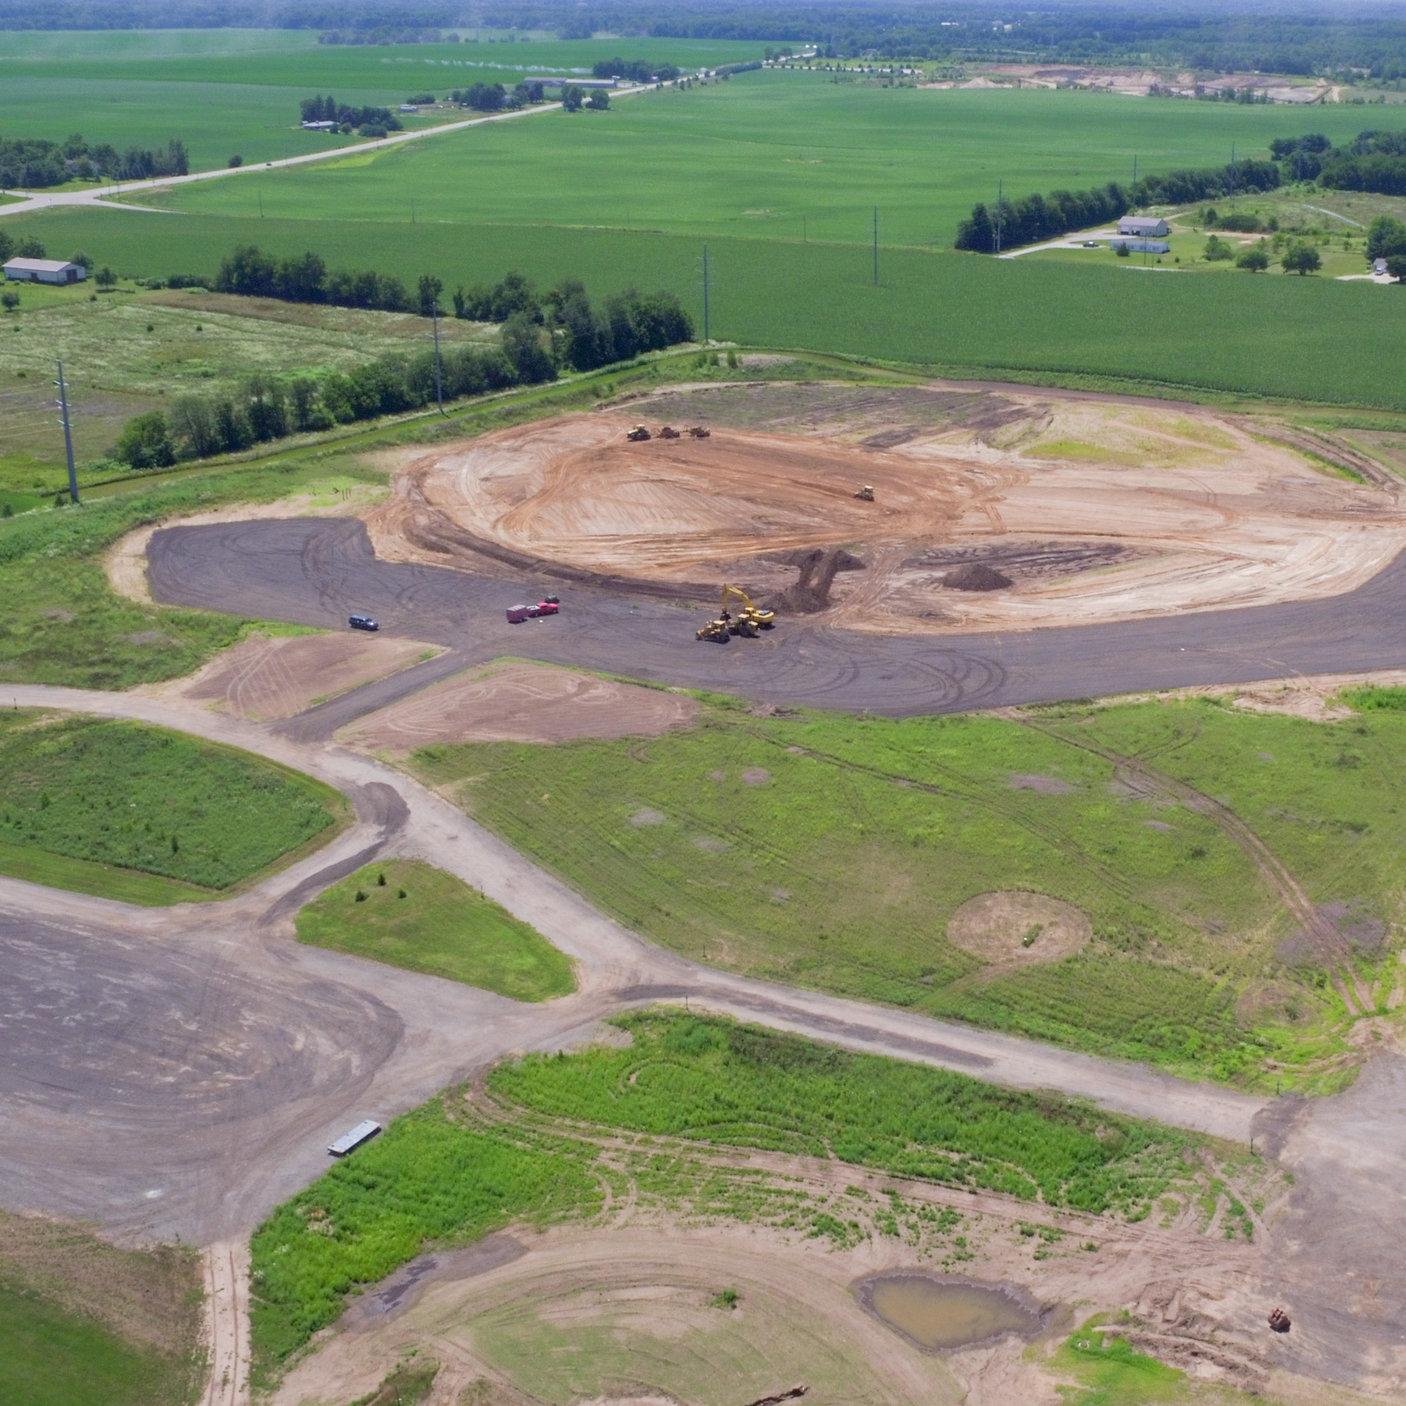 Excavation work begins on four baseball/softball fields.